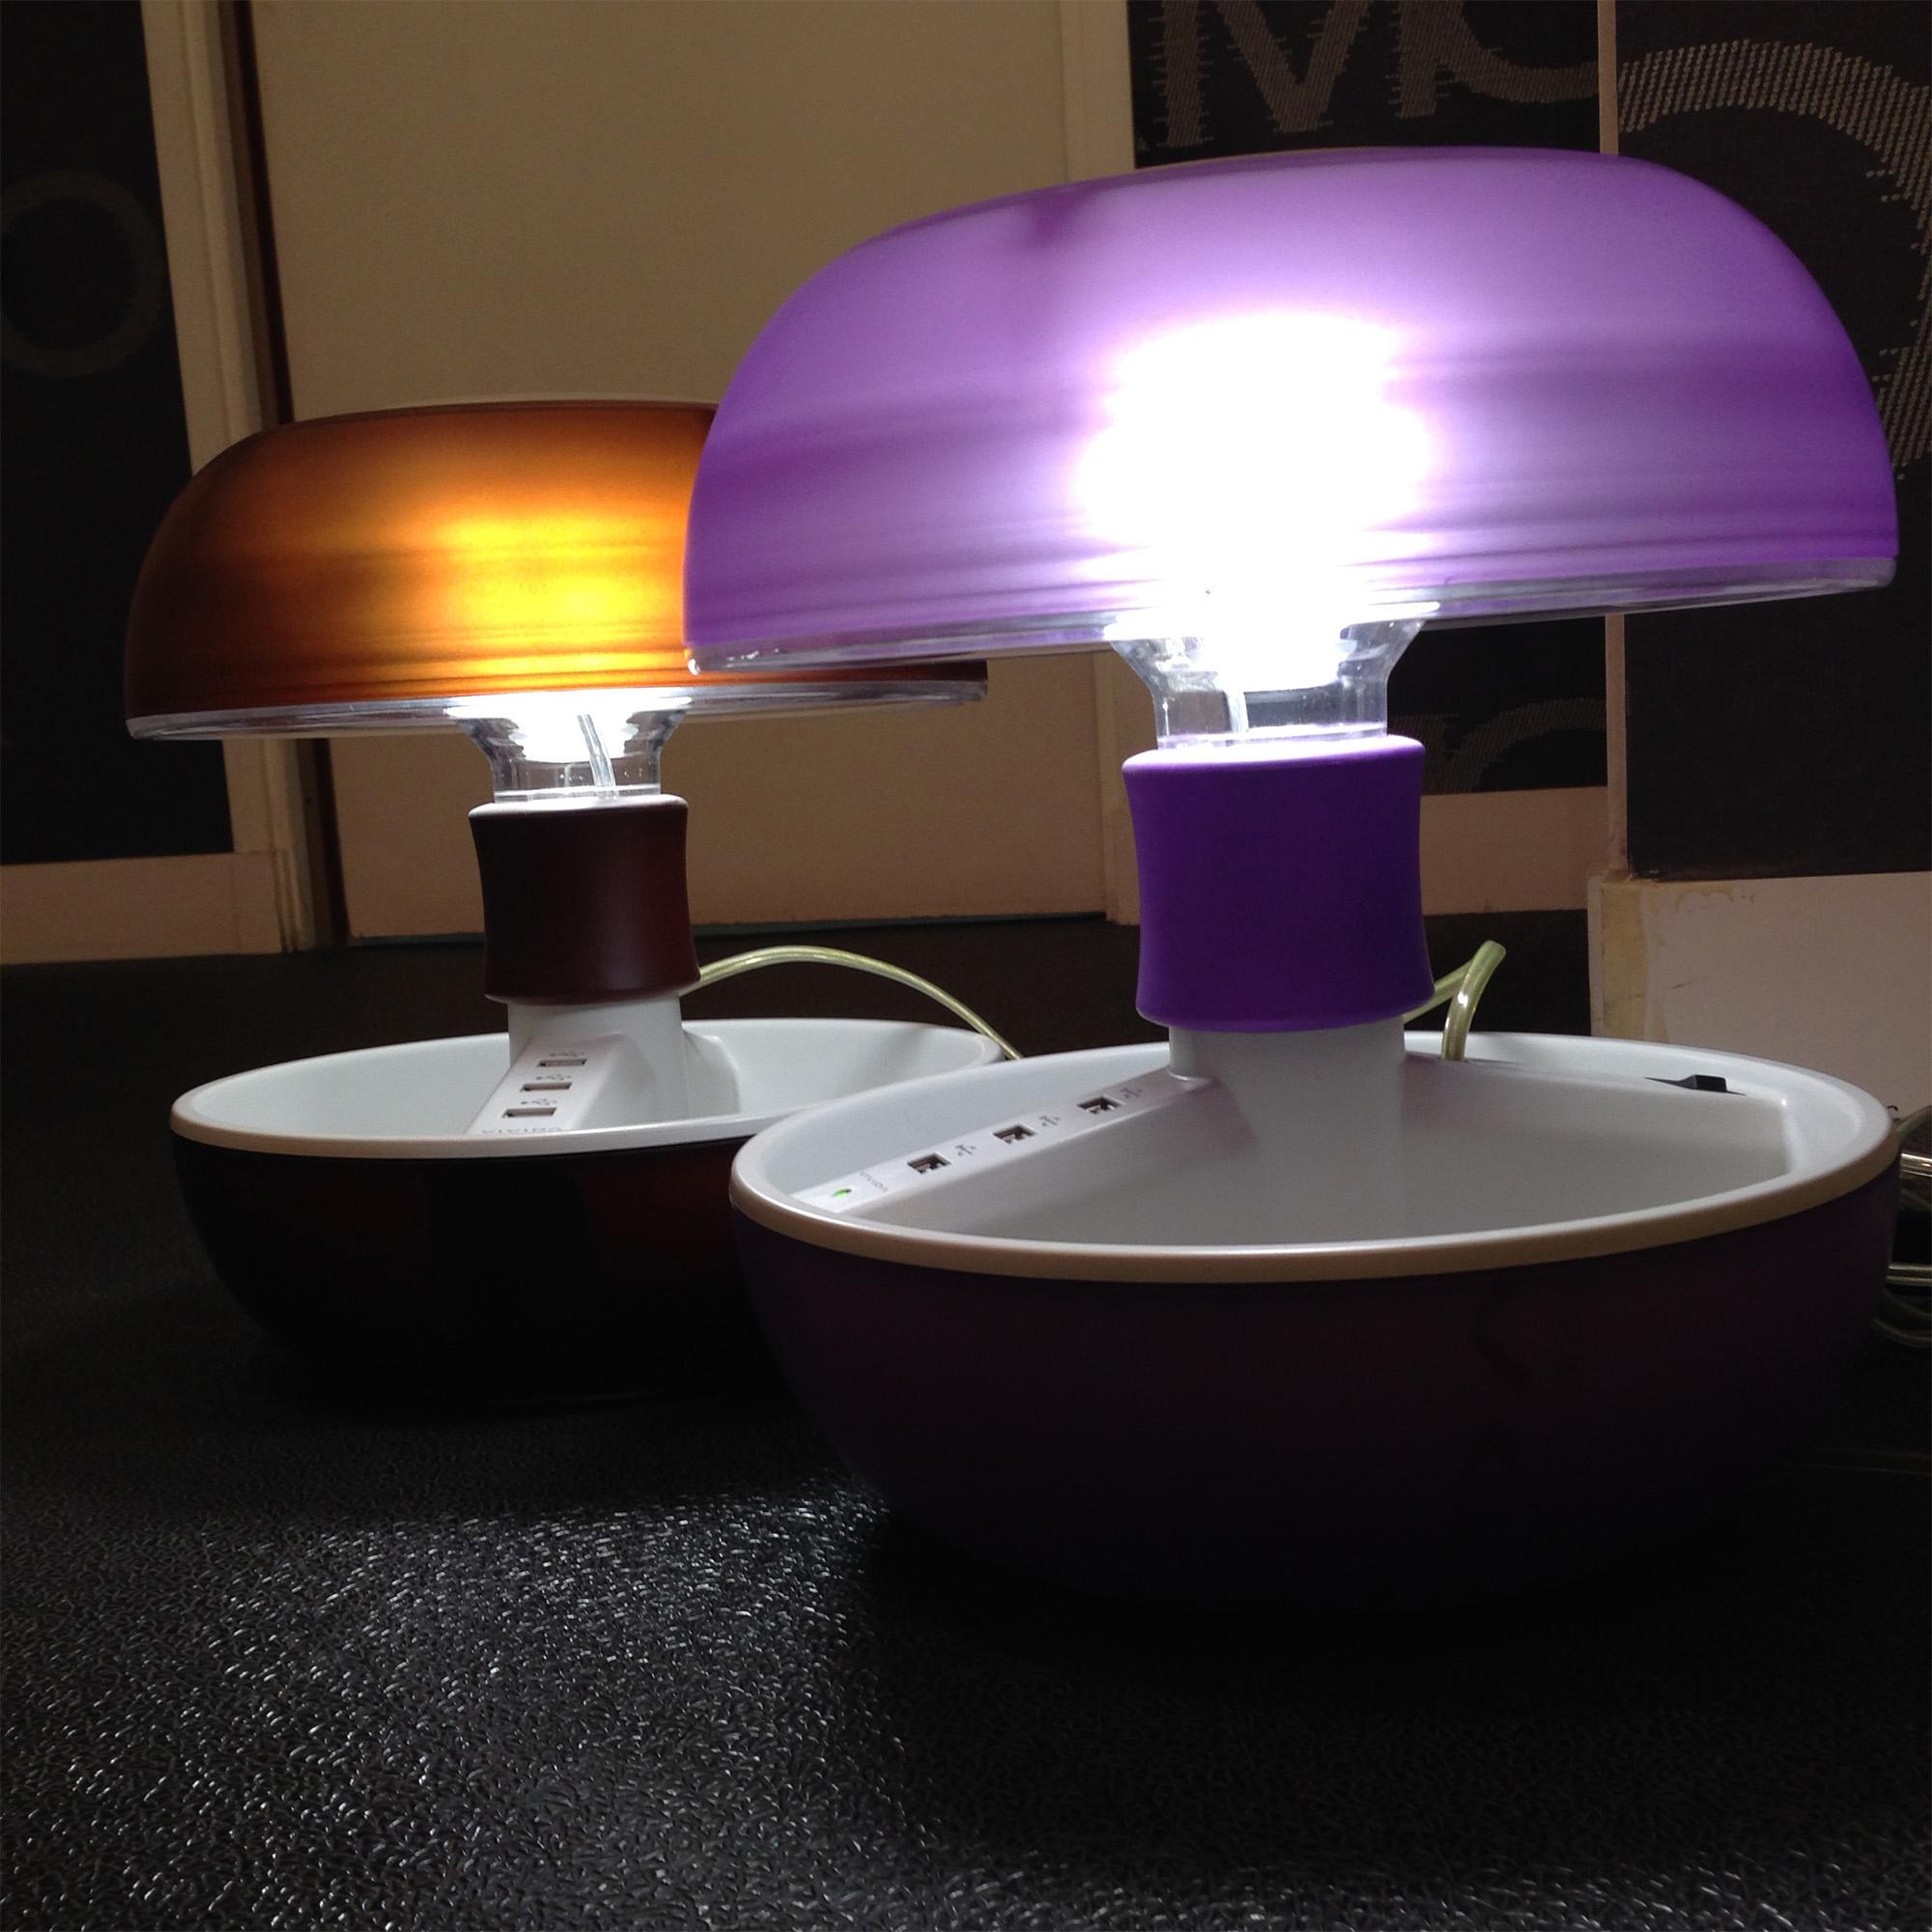 Dailykif_joyo_marron_violet